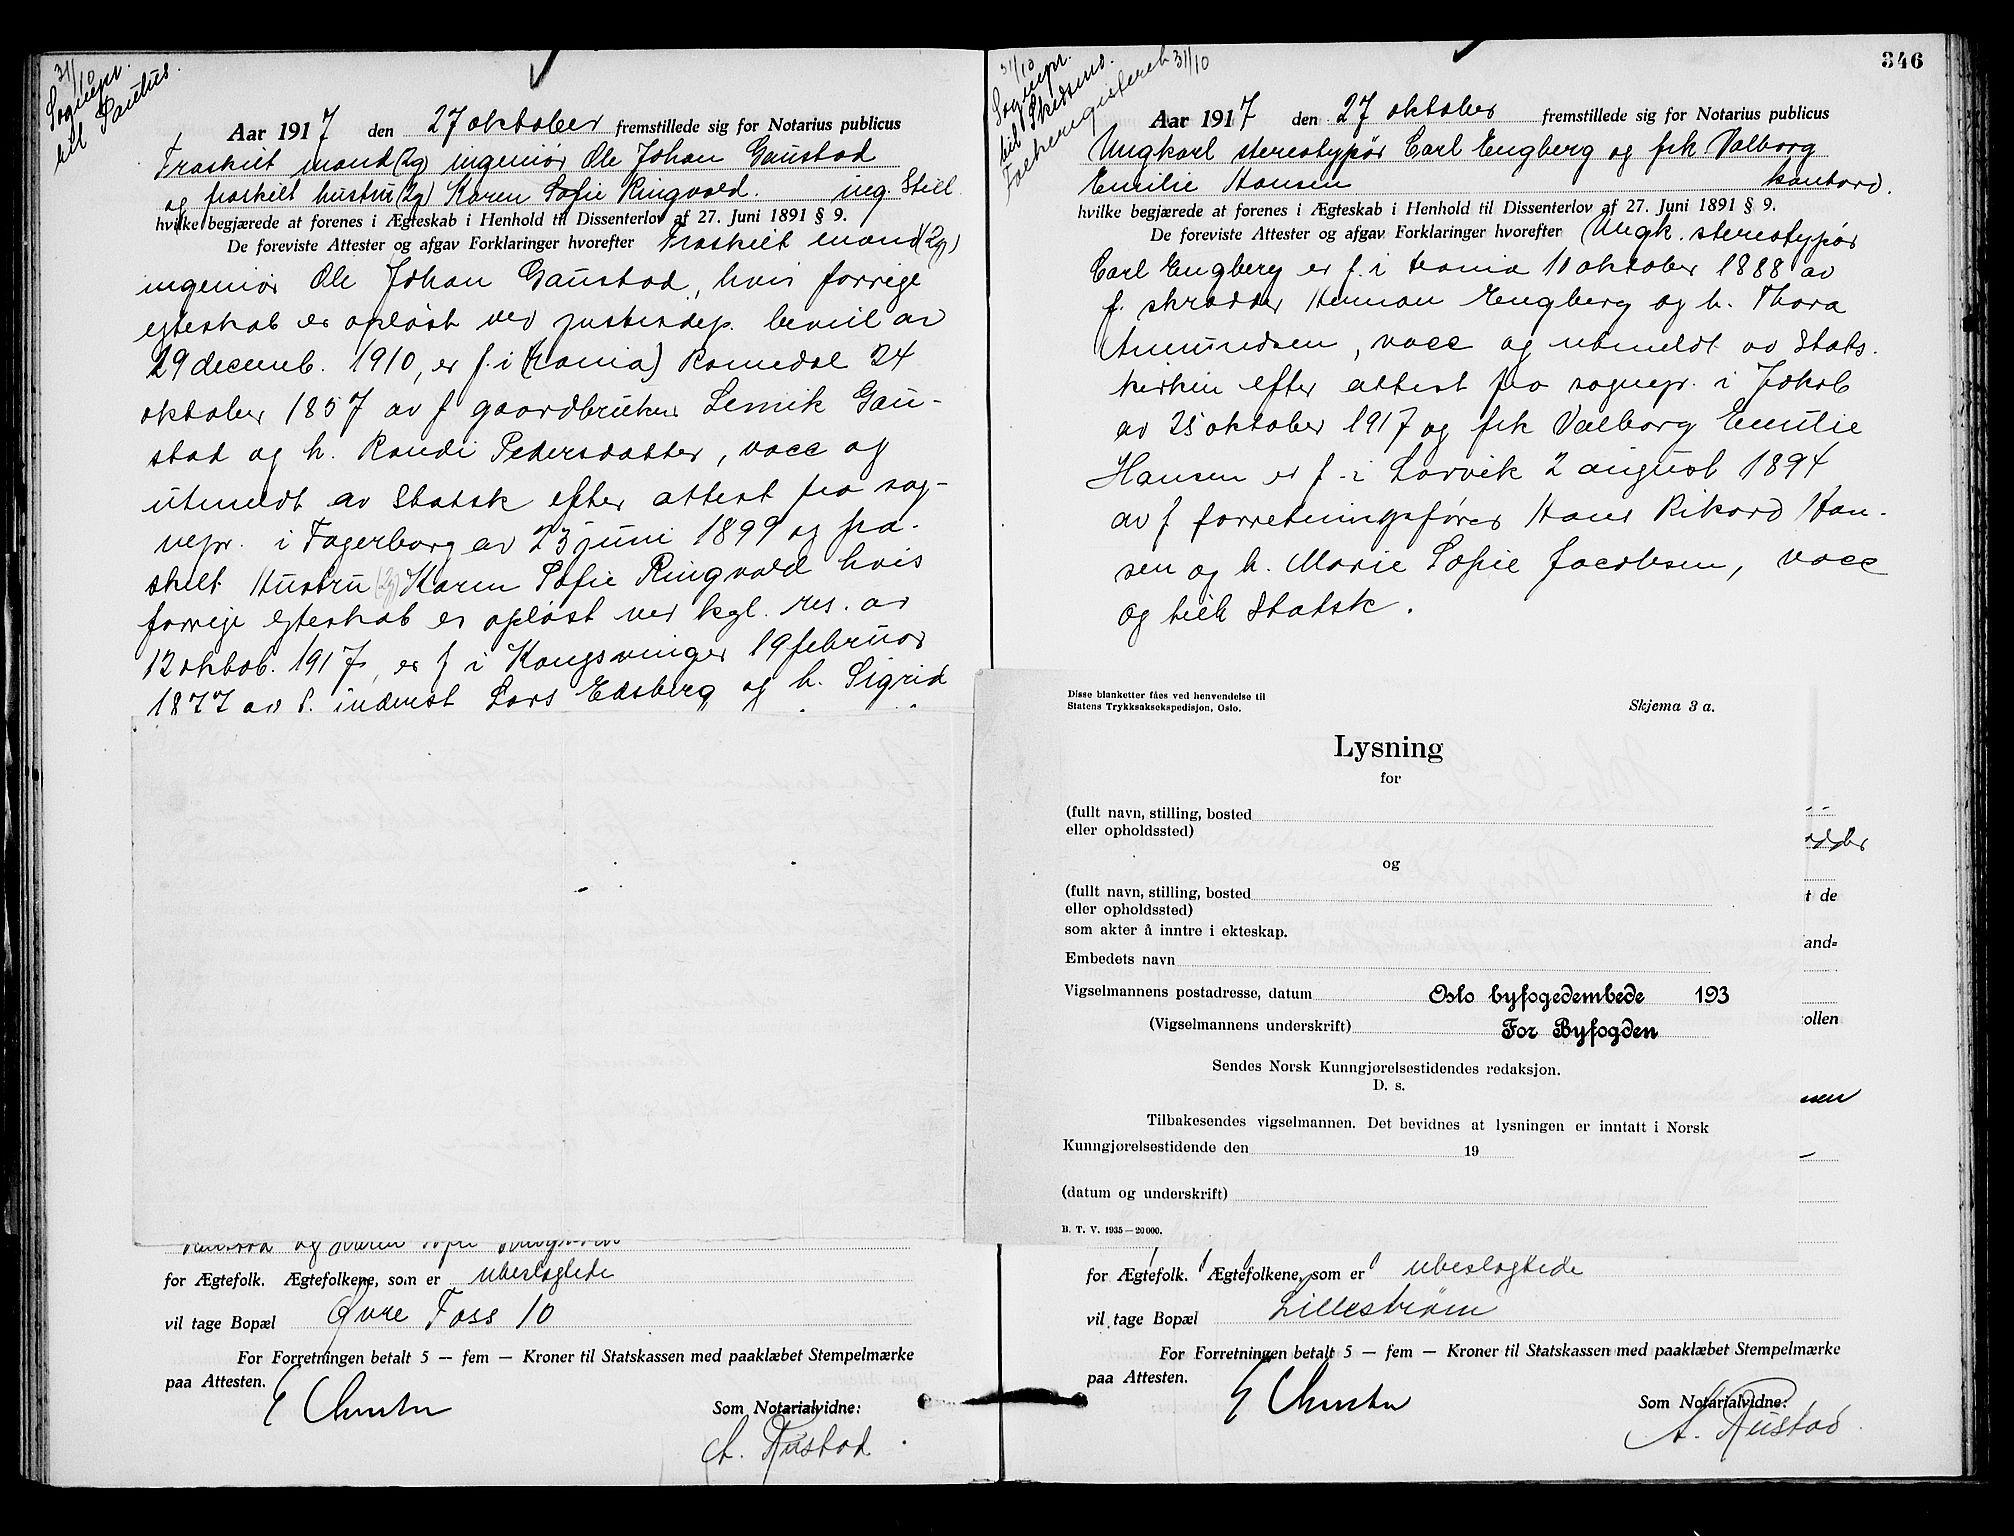 SAO, Oslo byfogd avd. I, L/Lb/Lbb/L0011: Notarialprotokoll, rekke II: Vigsler, 1916-1918, s. 345b-346a